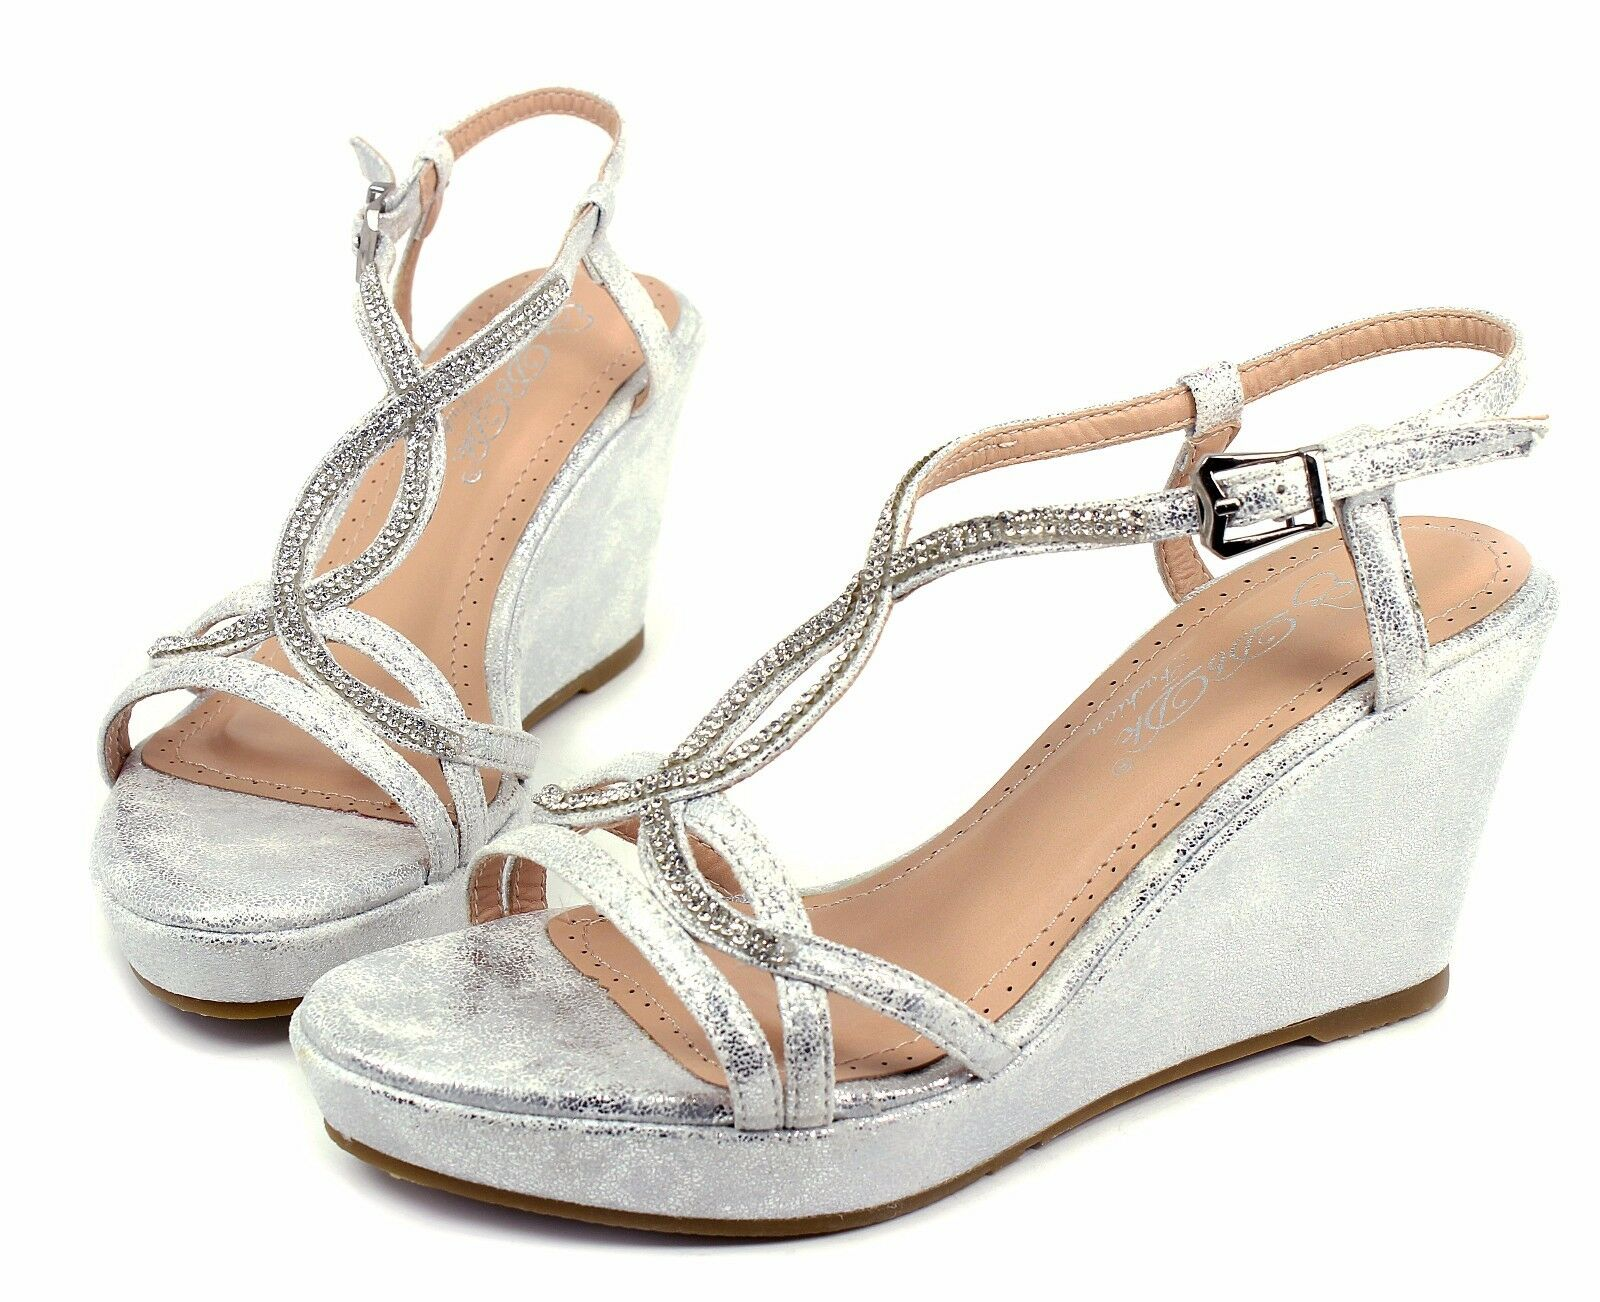 "MARIVE-5 Wedges Party Prom 3.2"" inch High Heel 1"" Platform W"